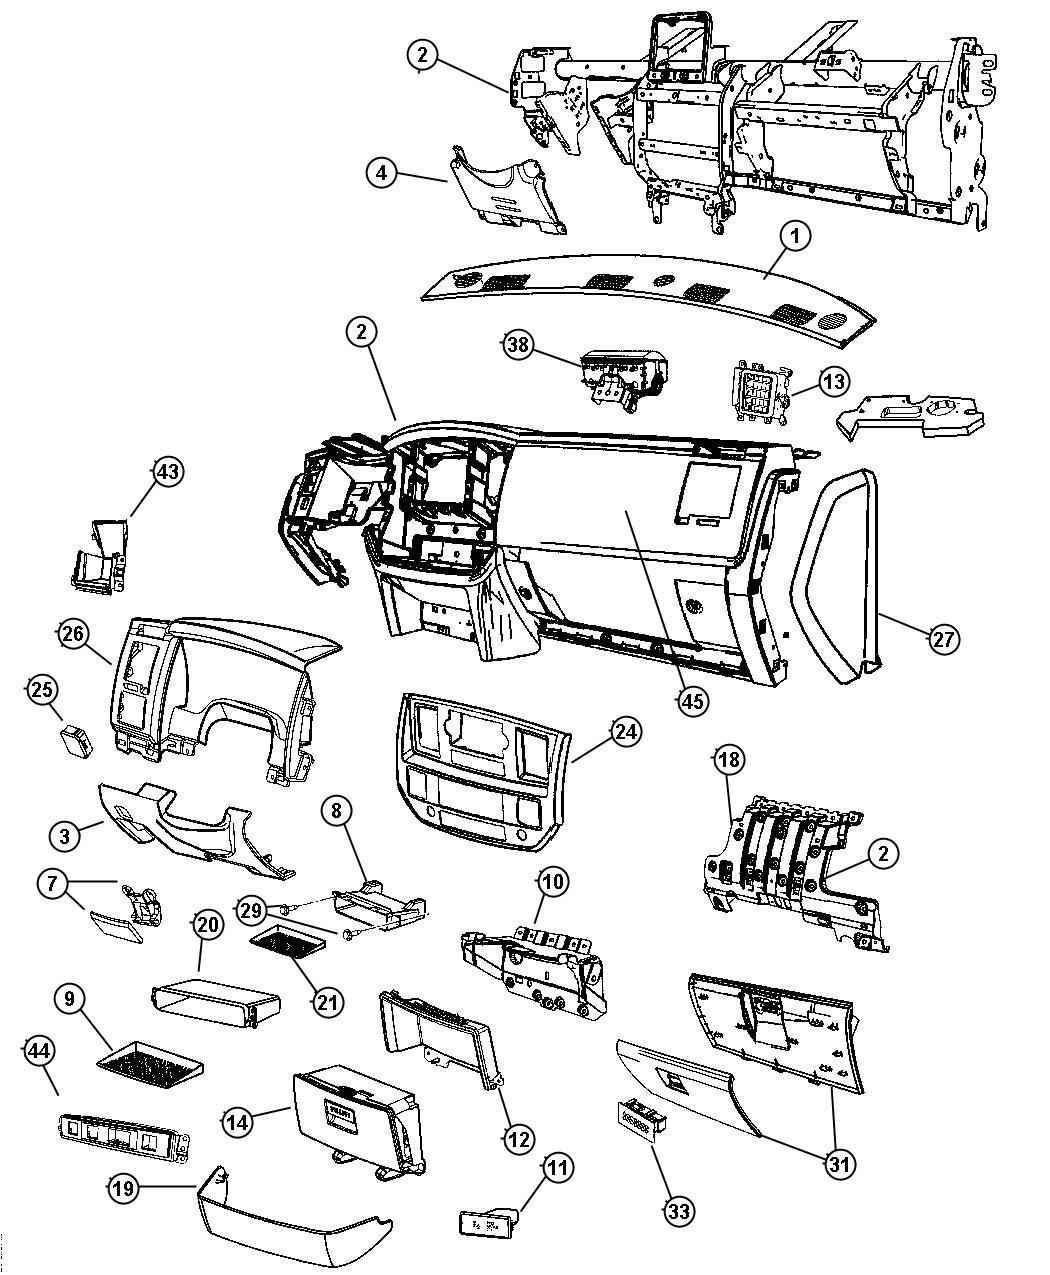 hight resolution of international s1900 truck manual rar tinyurl pg67t63